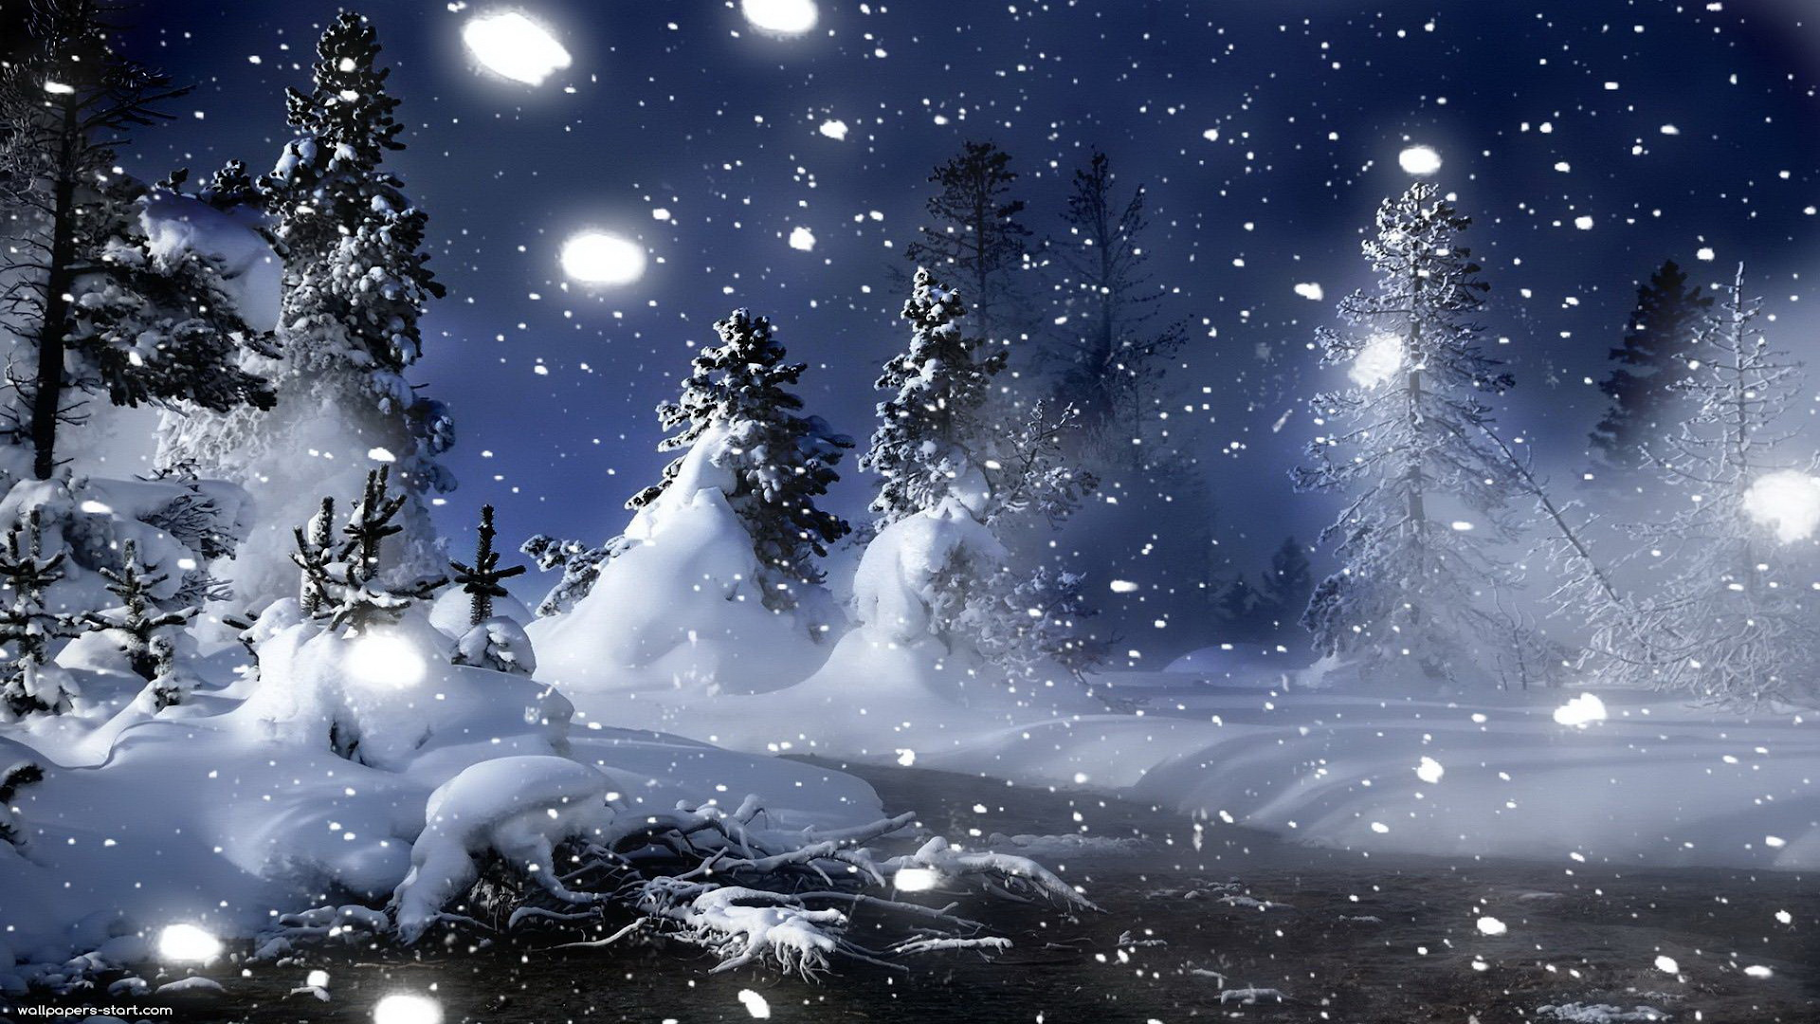 50+ Live Snow Falling Wallpaper on WallpaperSafari